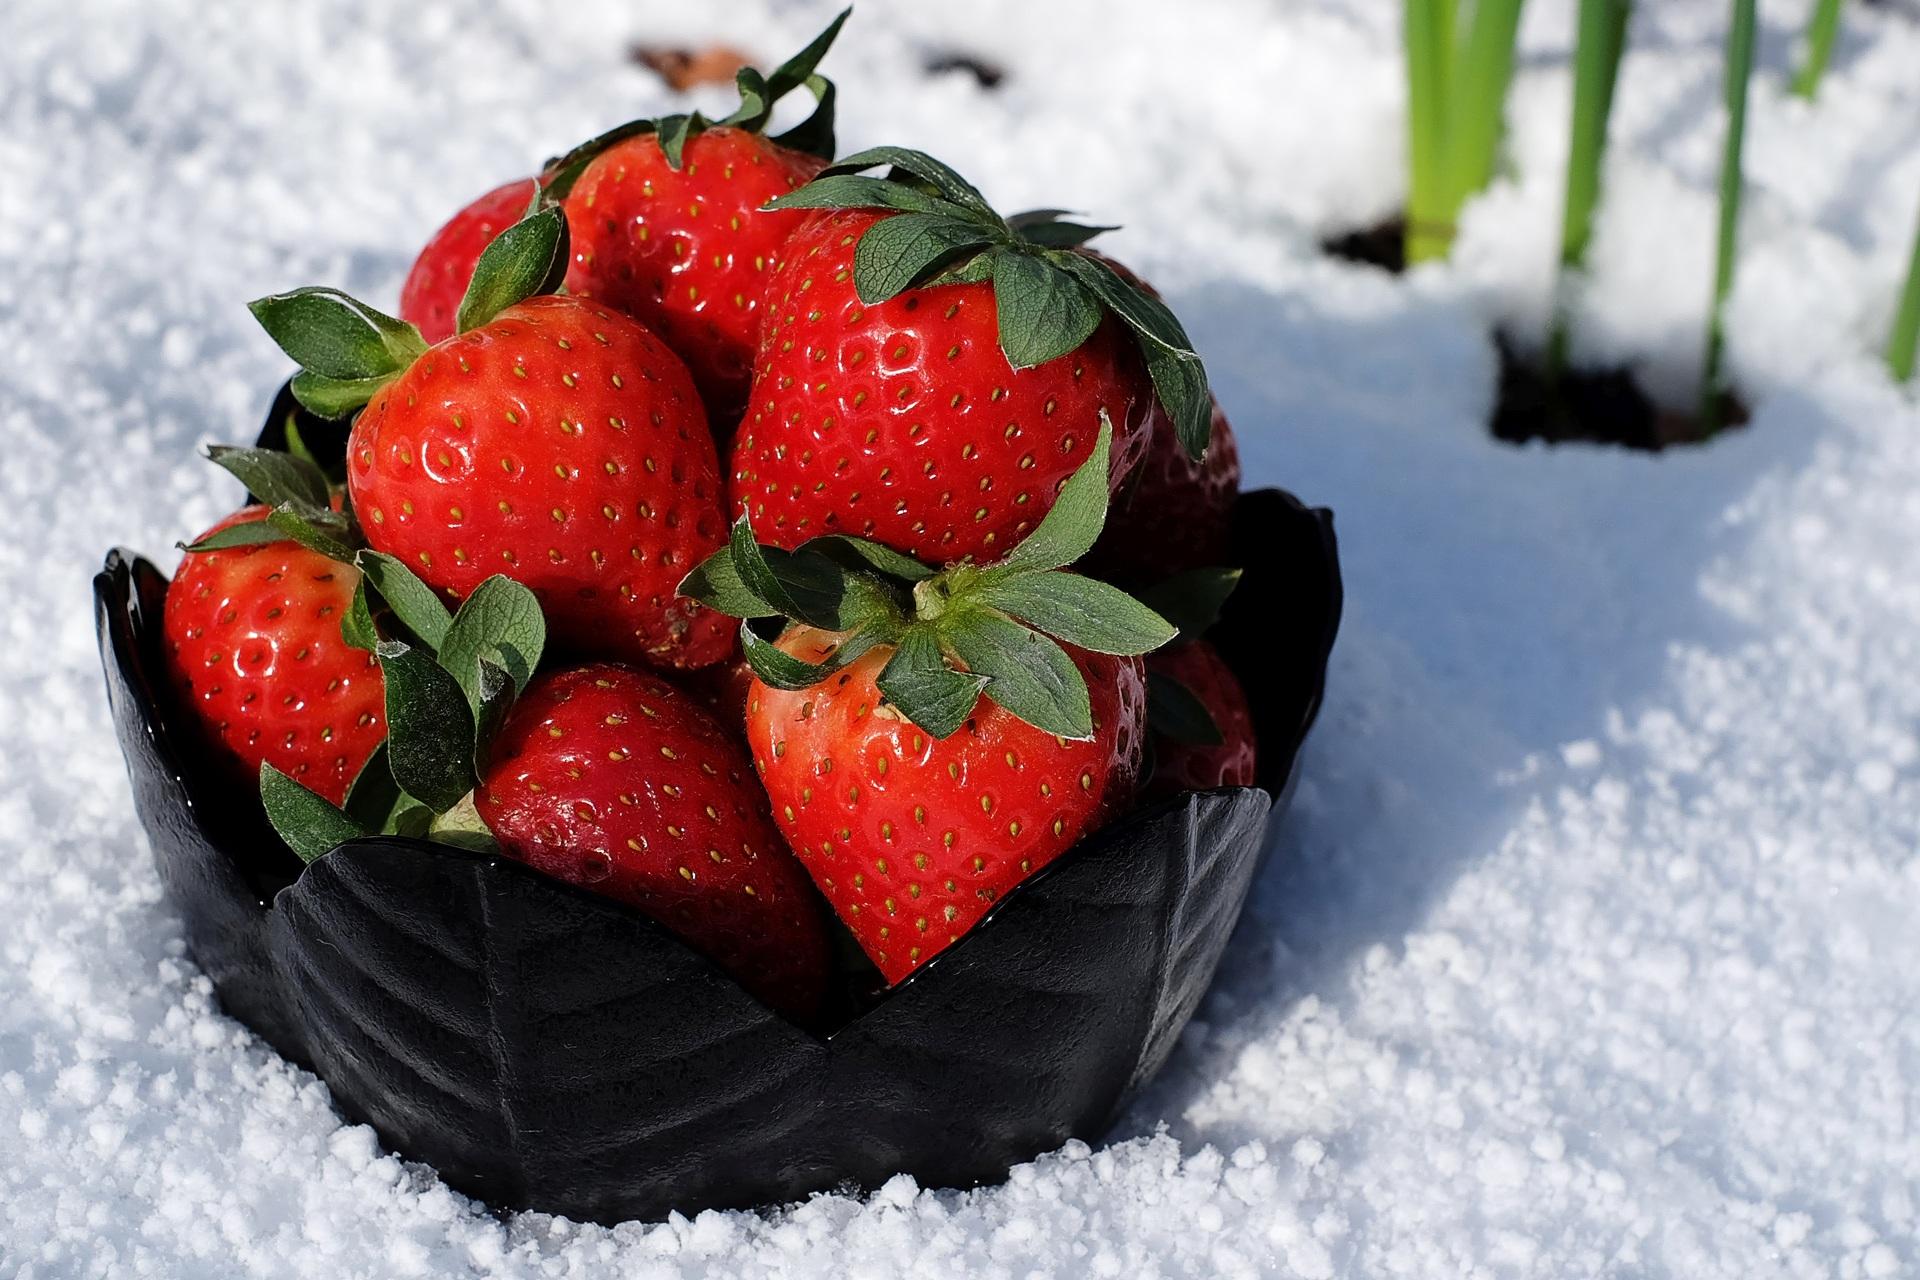 Strawberries | © Couleur pixabay.com